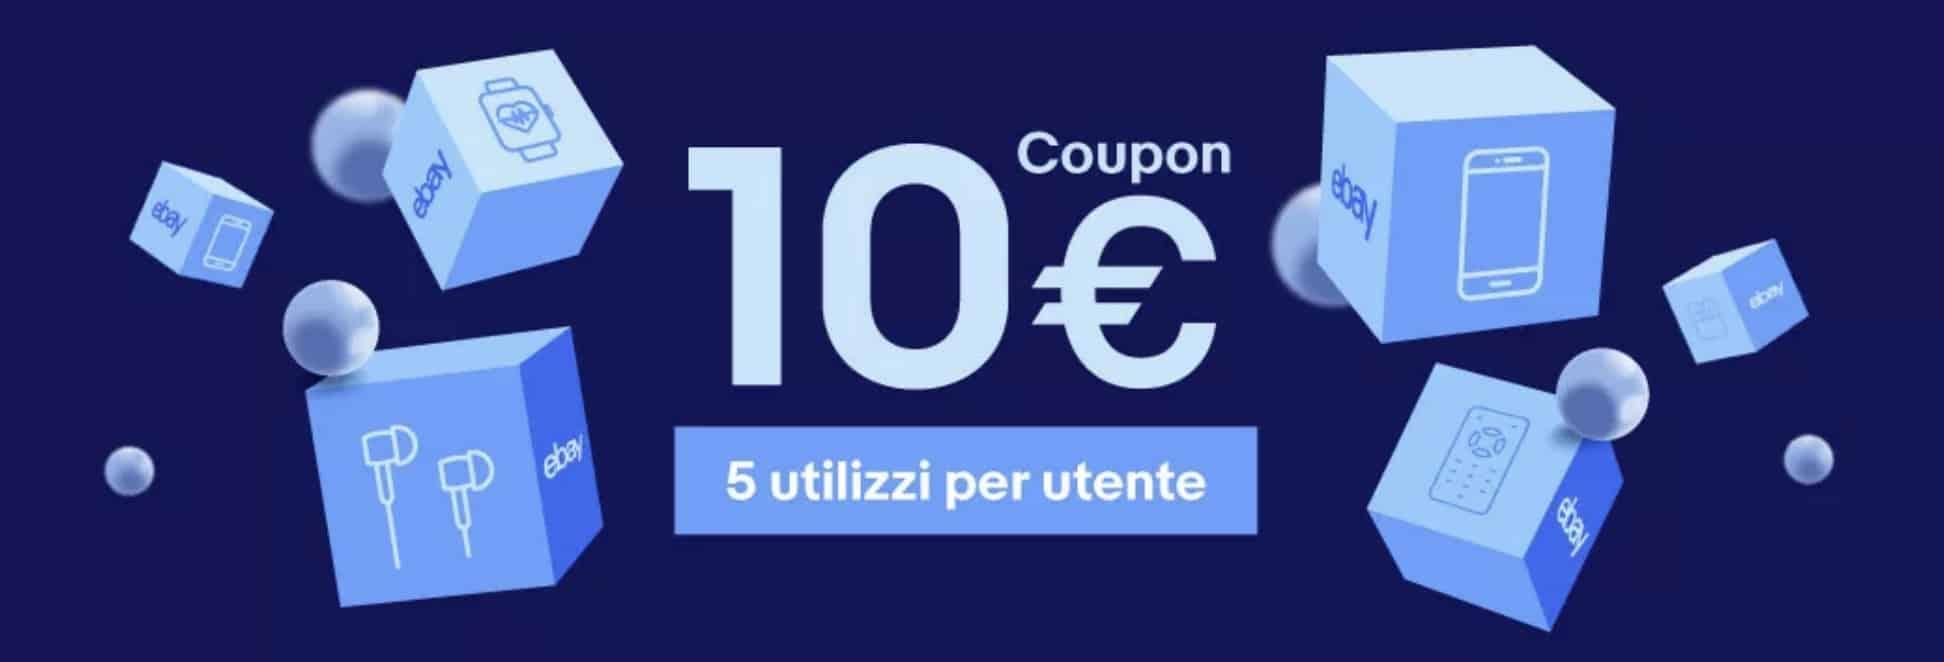 ebay coupon 2021 10 euro